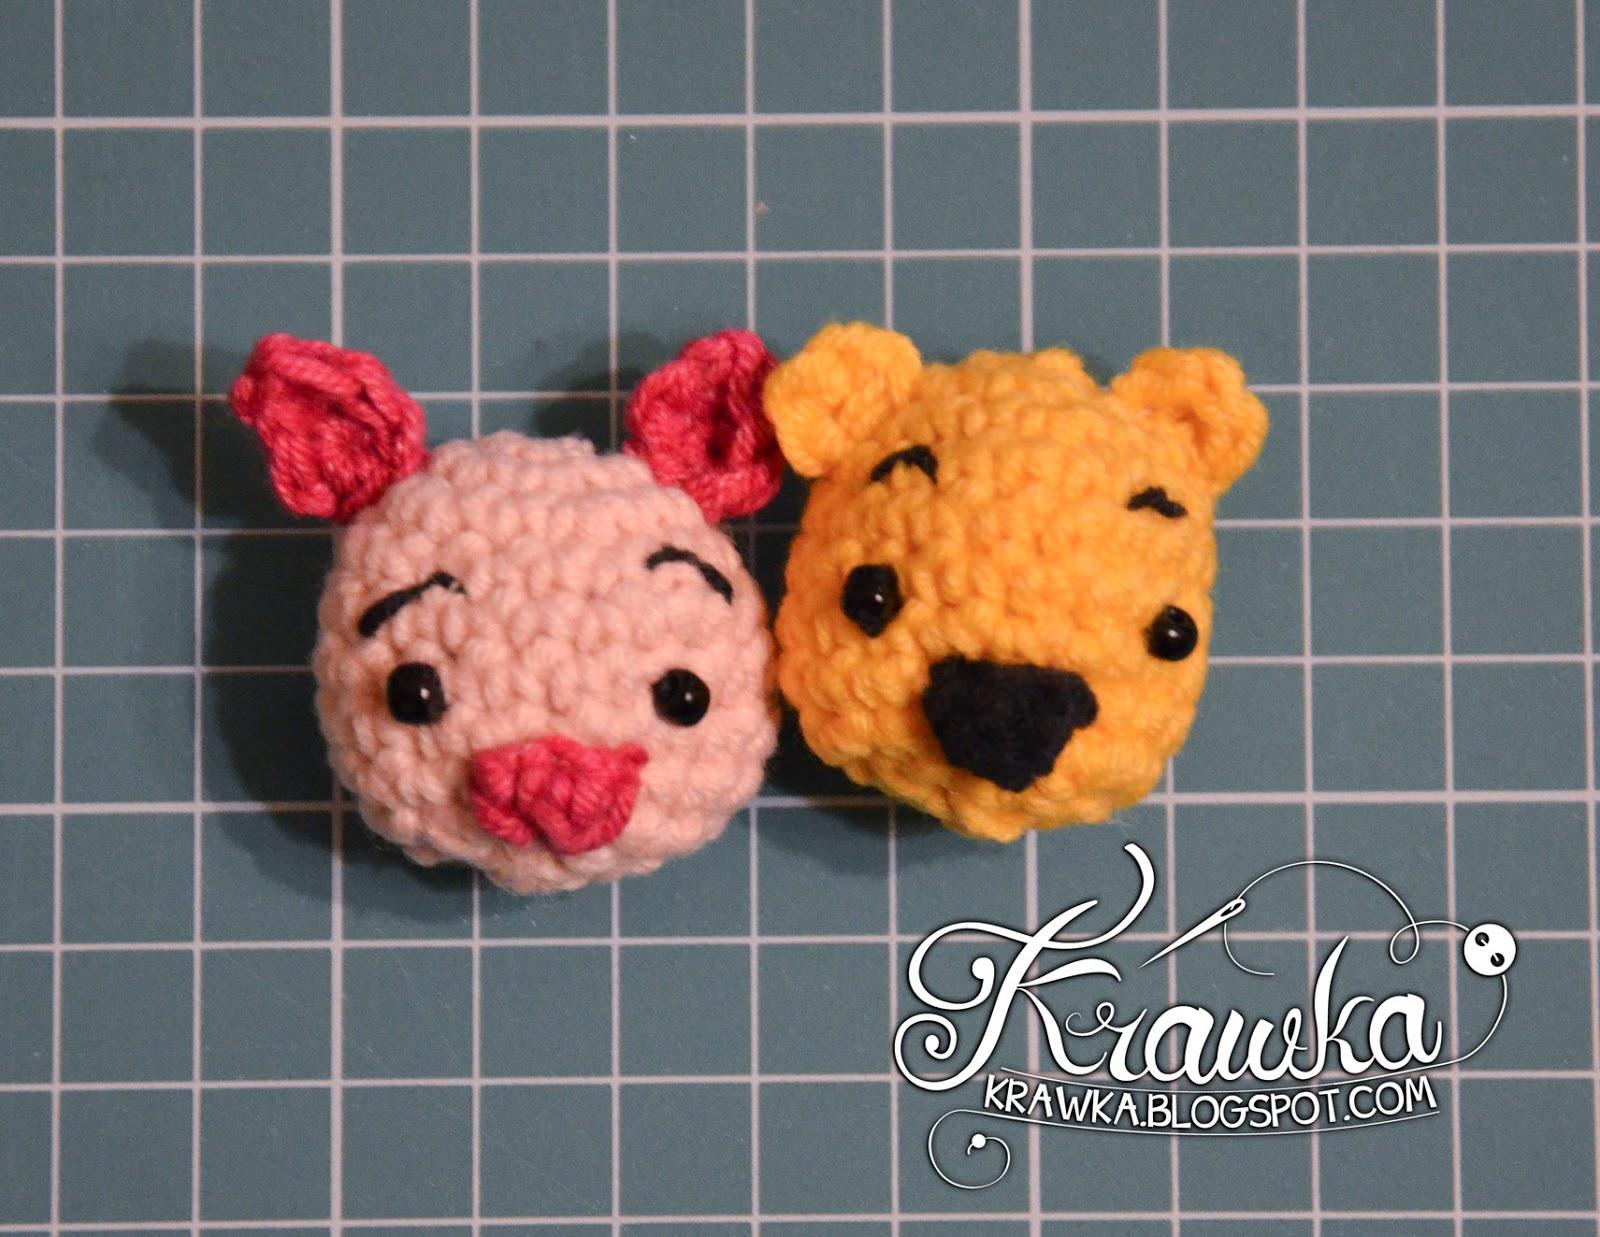 Tsum Tsum Amigurumi Pattern Free : Krawka pooh and friends minis pattern